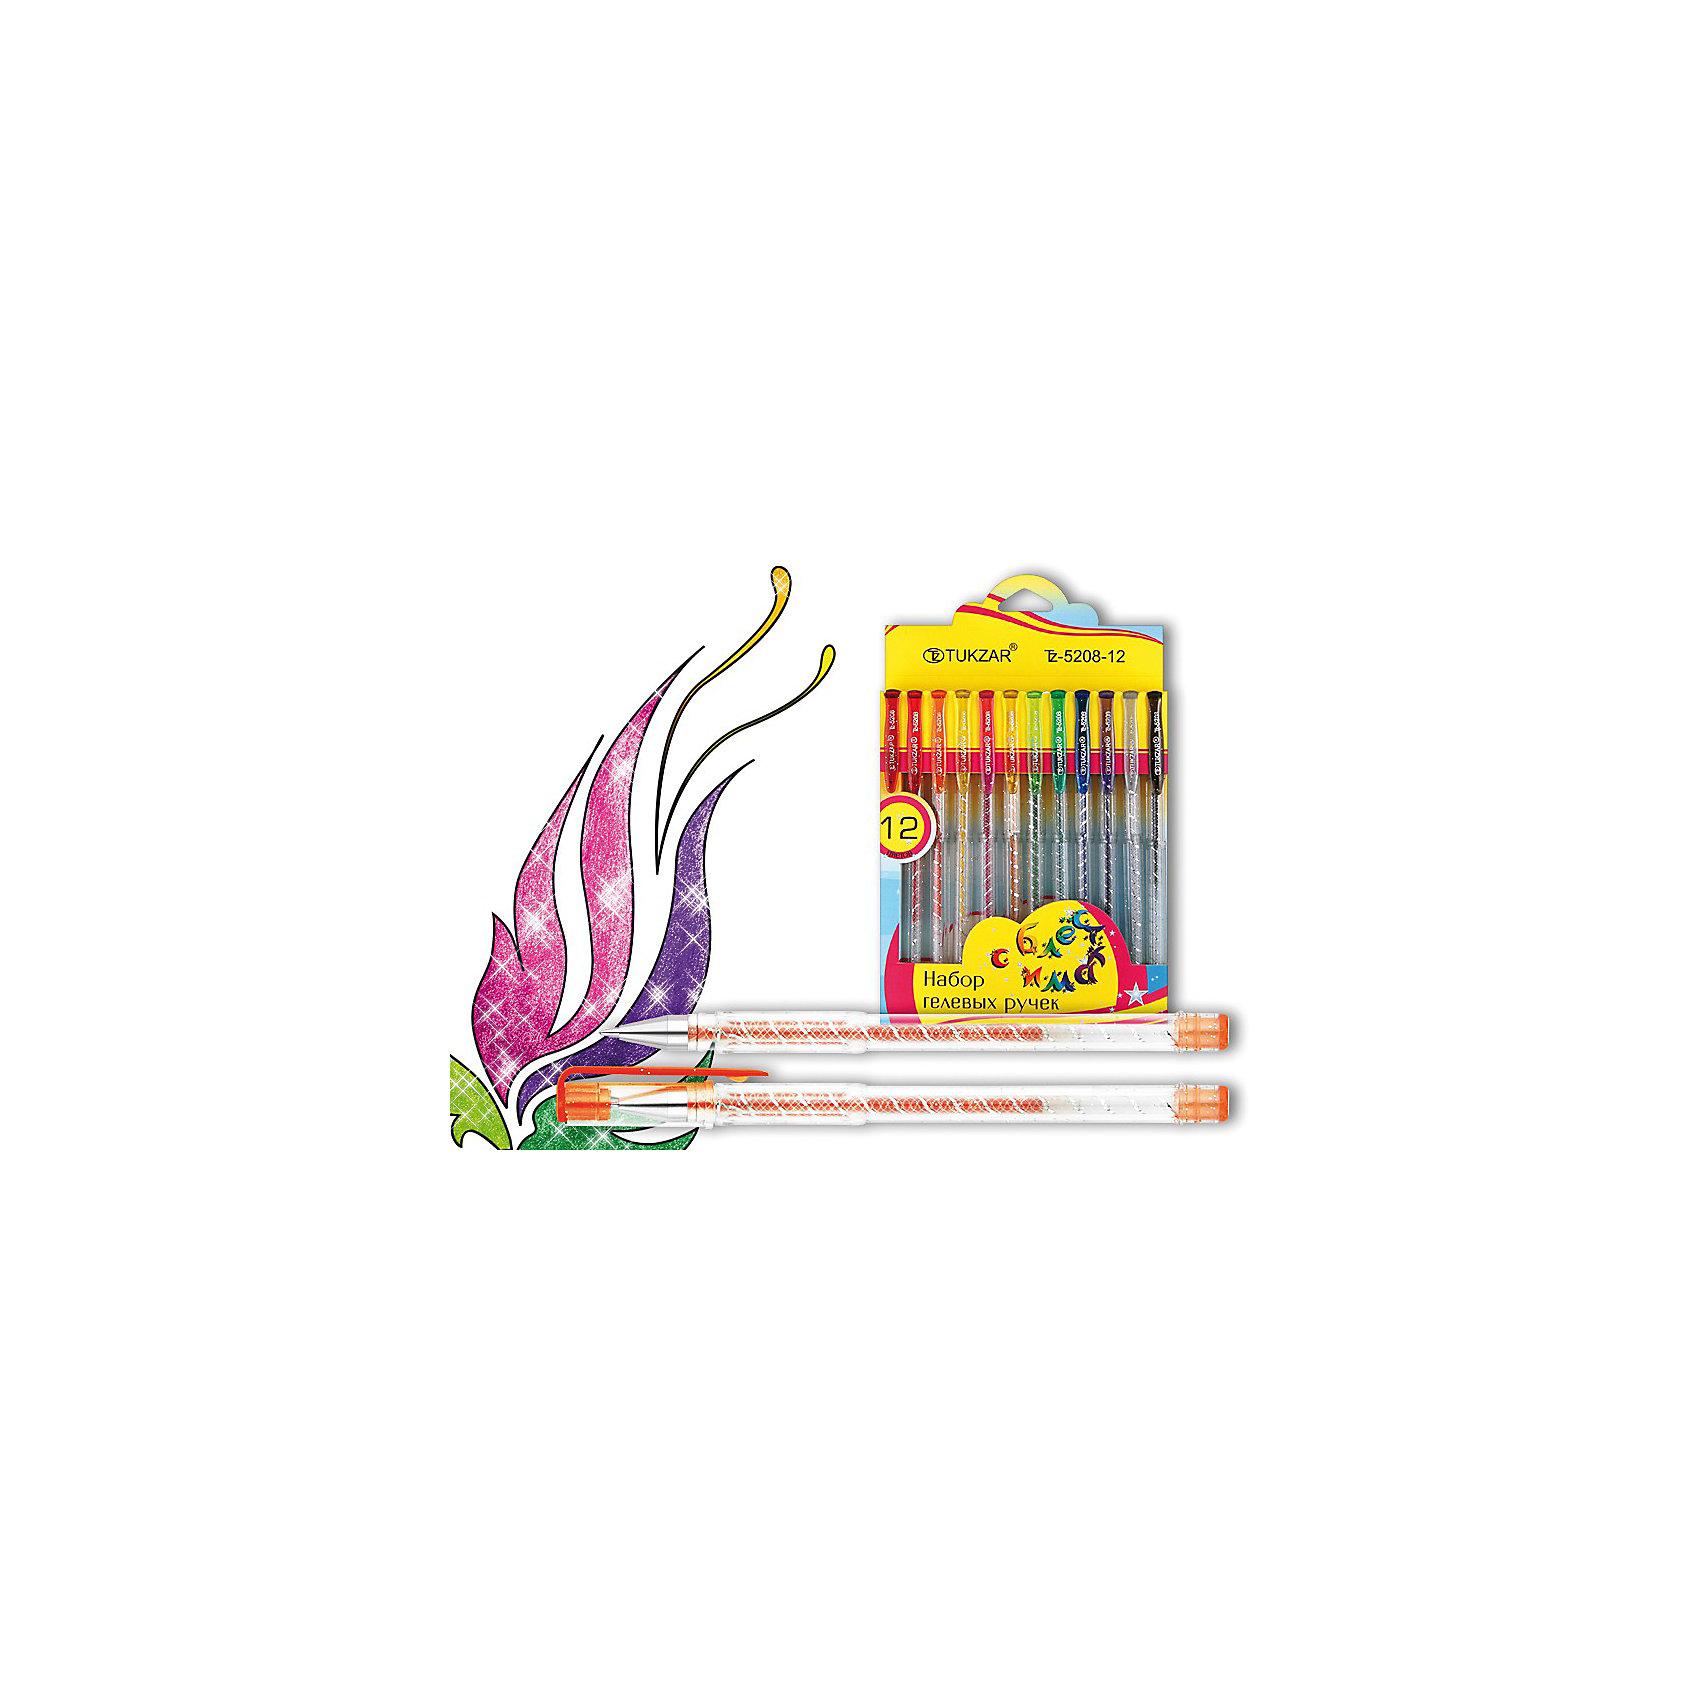 TUKZAR TUKZAR Набор гелевых ручек суперметаллик 12 цв. tukzar tukzar набор шариковых ручек  10 цветов